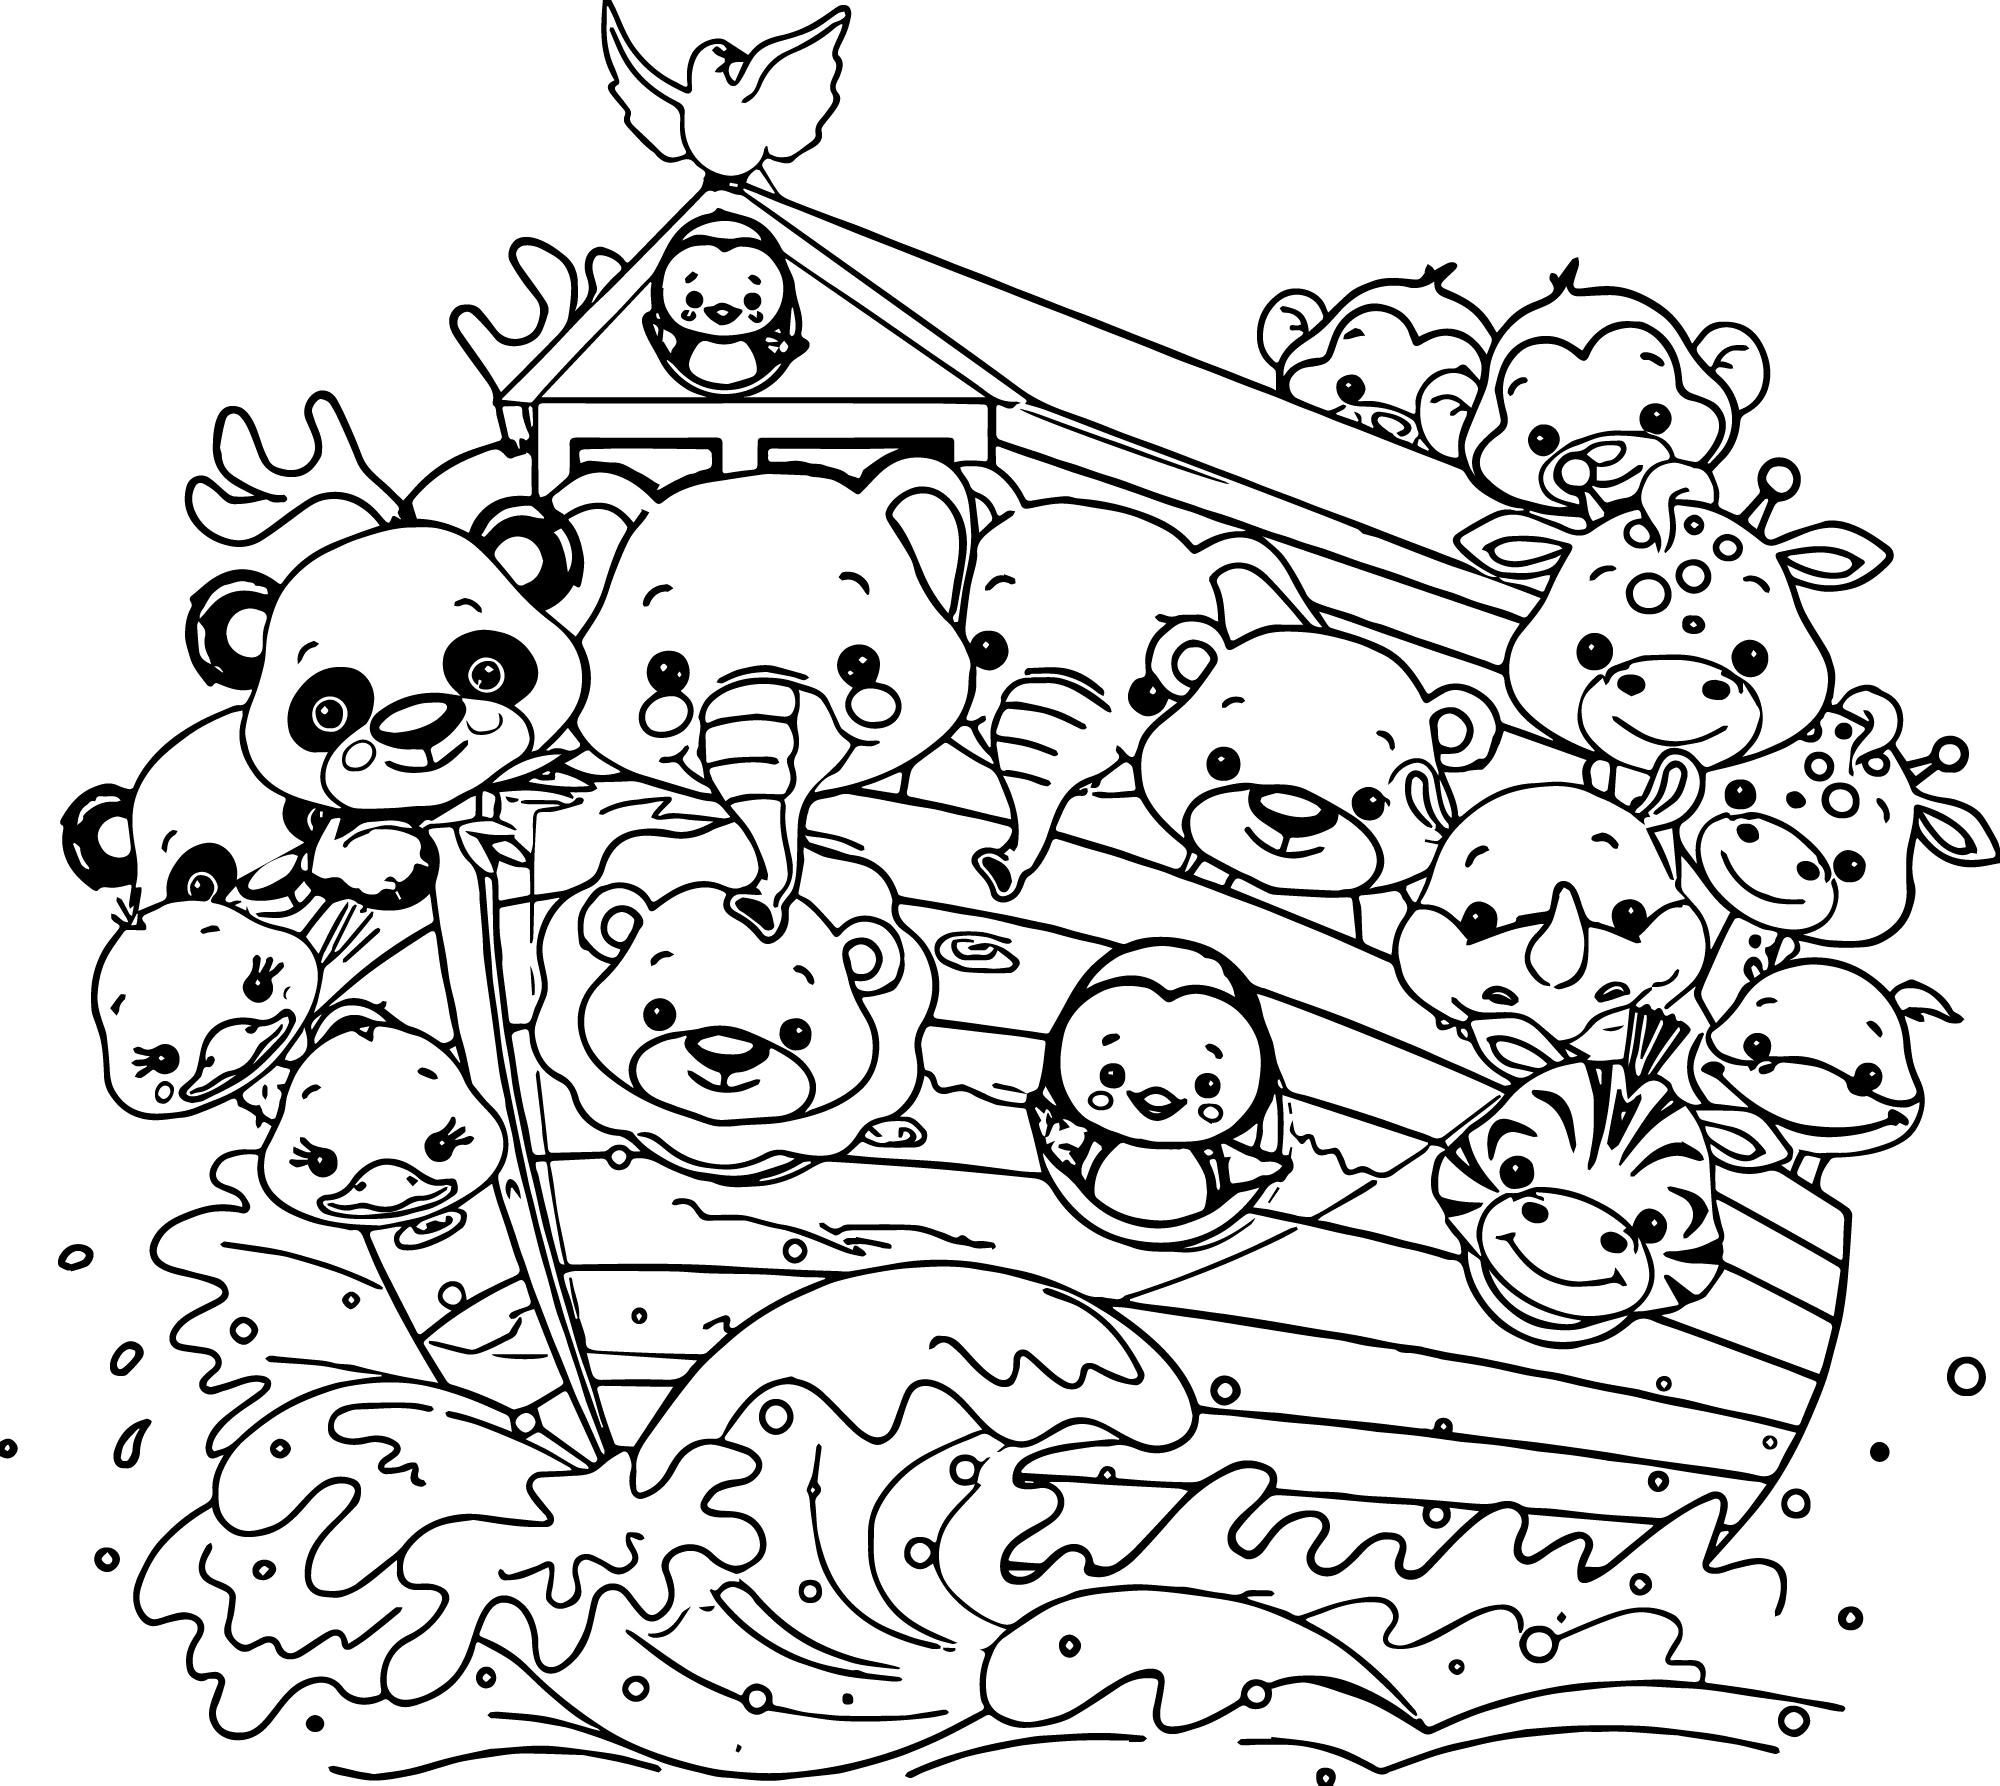 Noahs Ark Drawing At Getdrawings